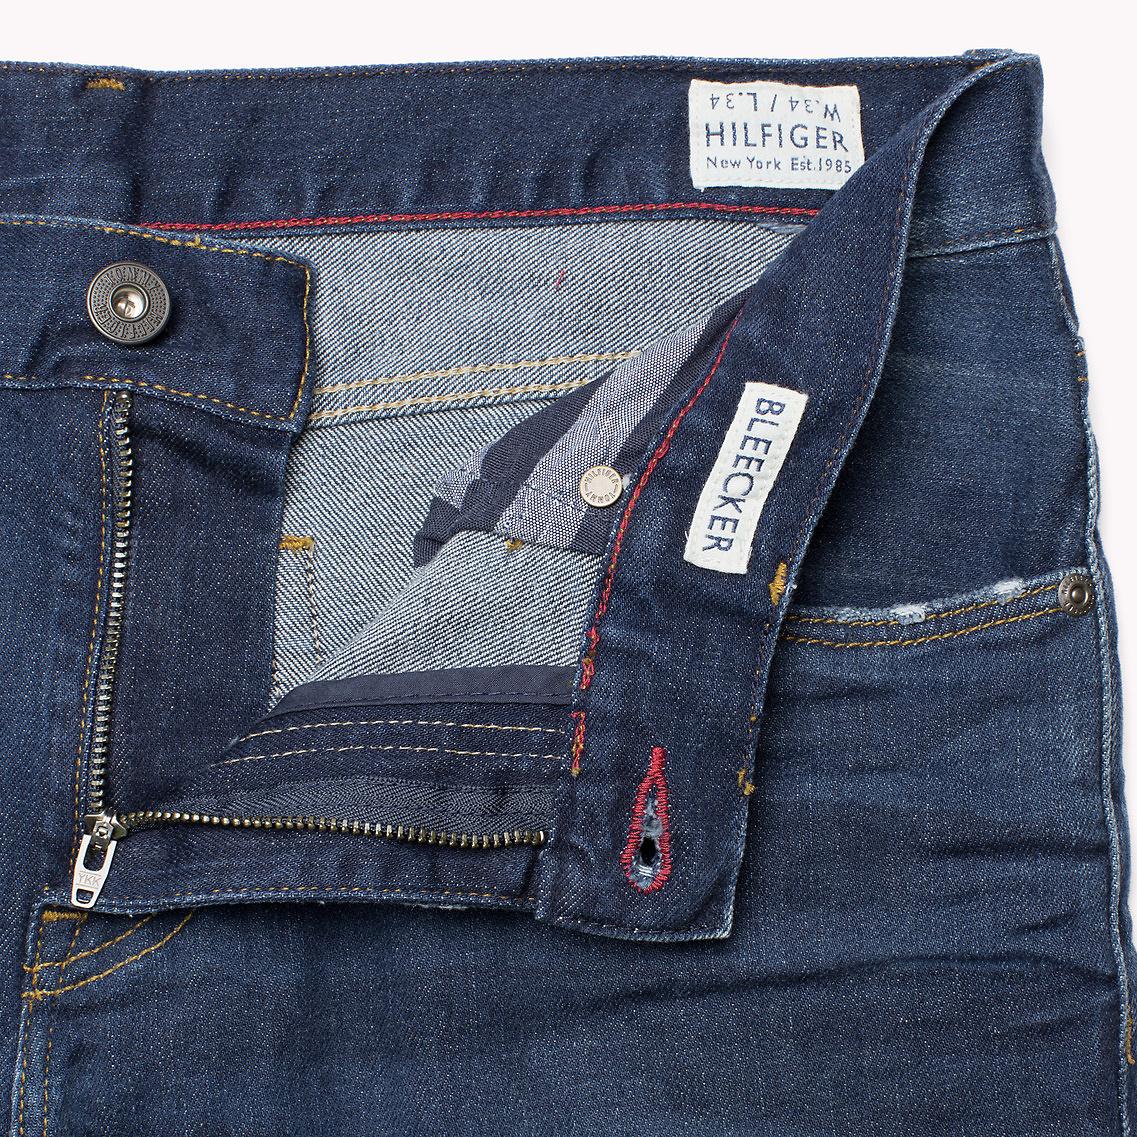 b24ae651 Tommy Hilfiger Bleecker Slim Fit Jeans In Blue For Men Lyst